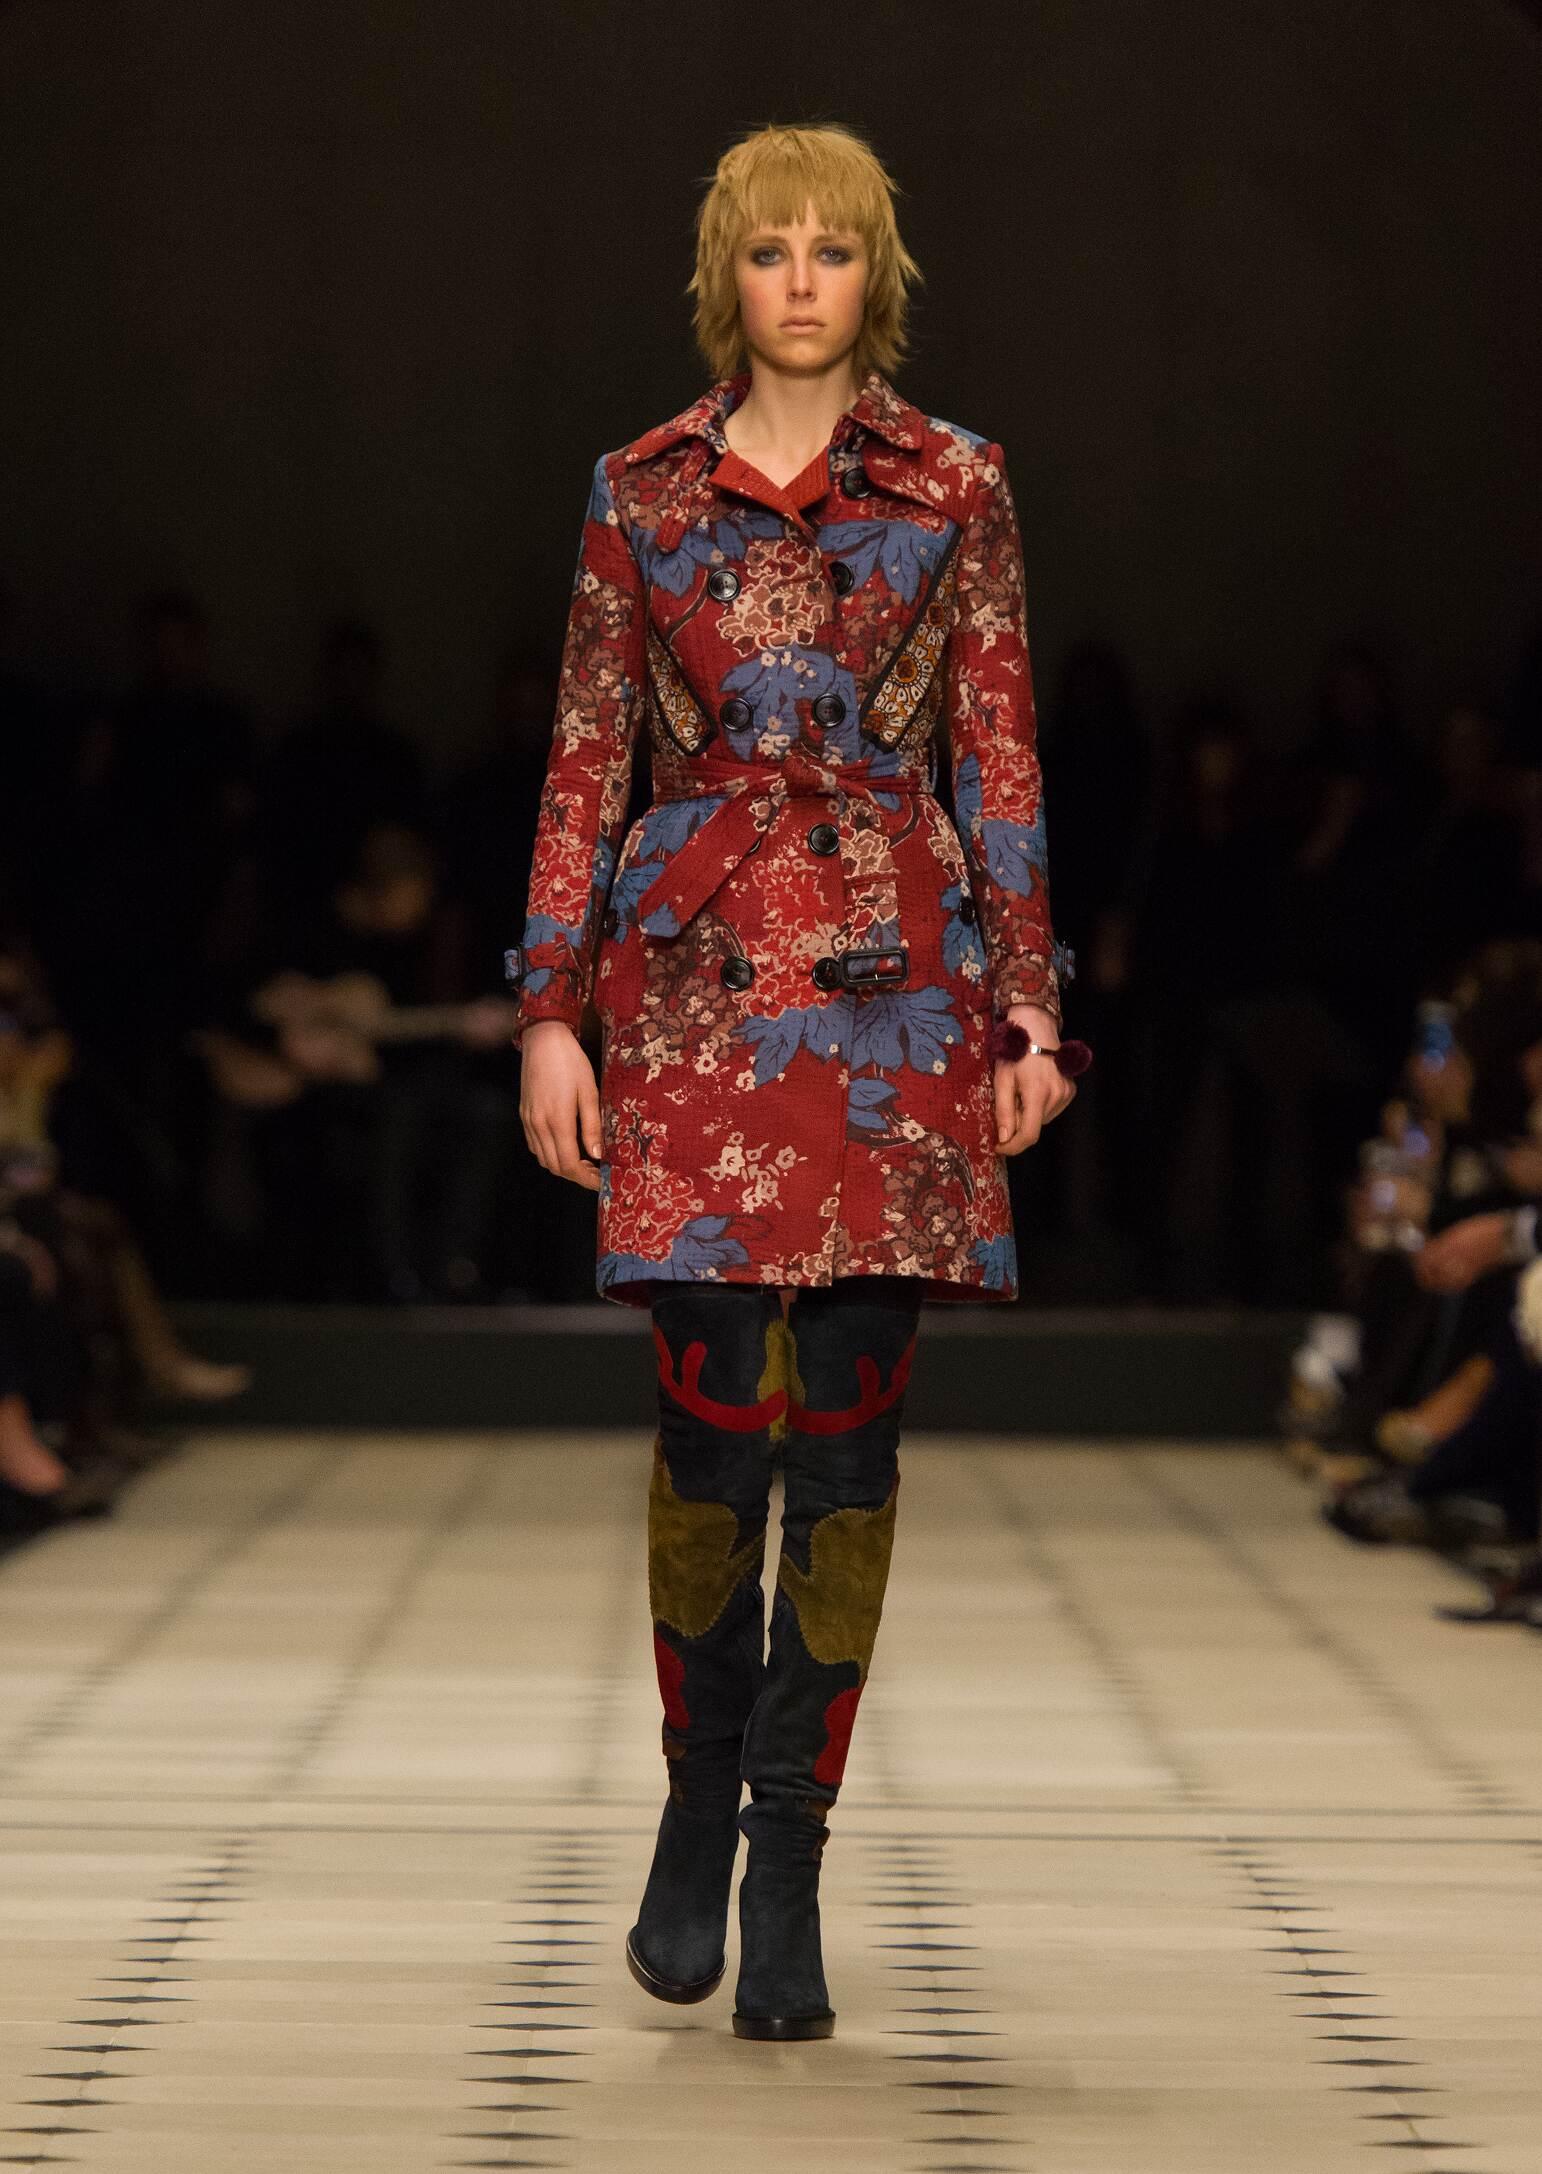 Winter 2015 Fashion Show Burberry Prorsum Collection